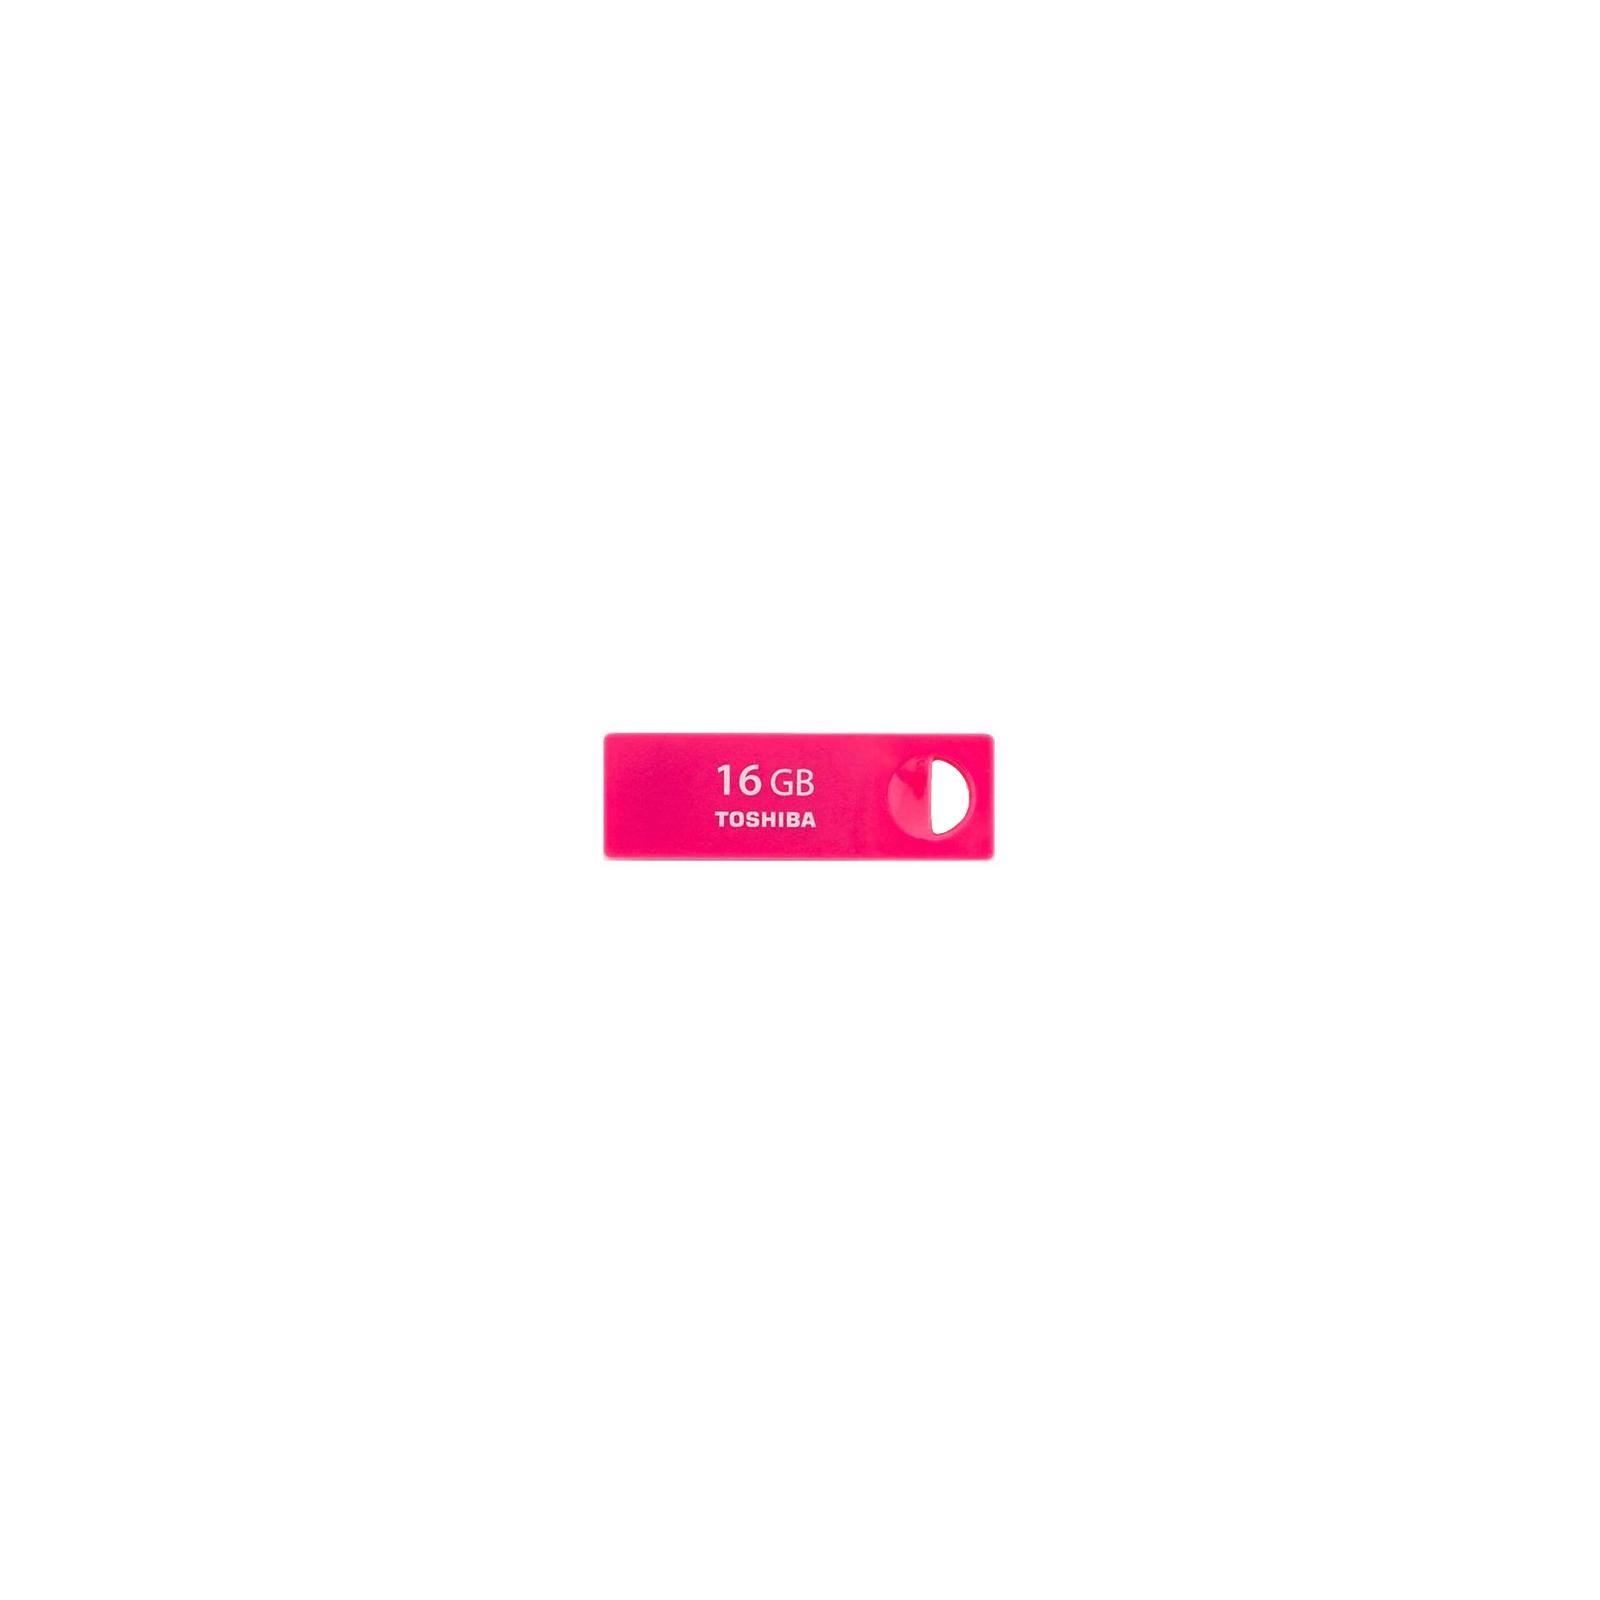 USB флеш накопитель TOSHIBA 16Gb Rosered (THNU16ENSRED(BL5)